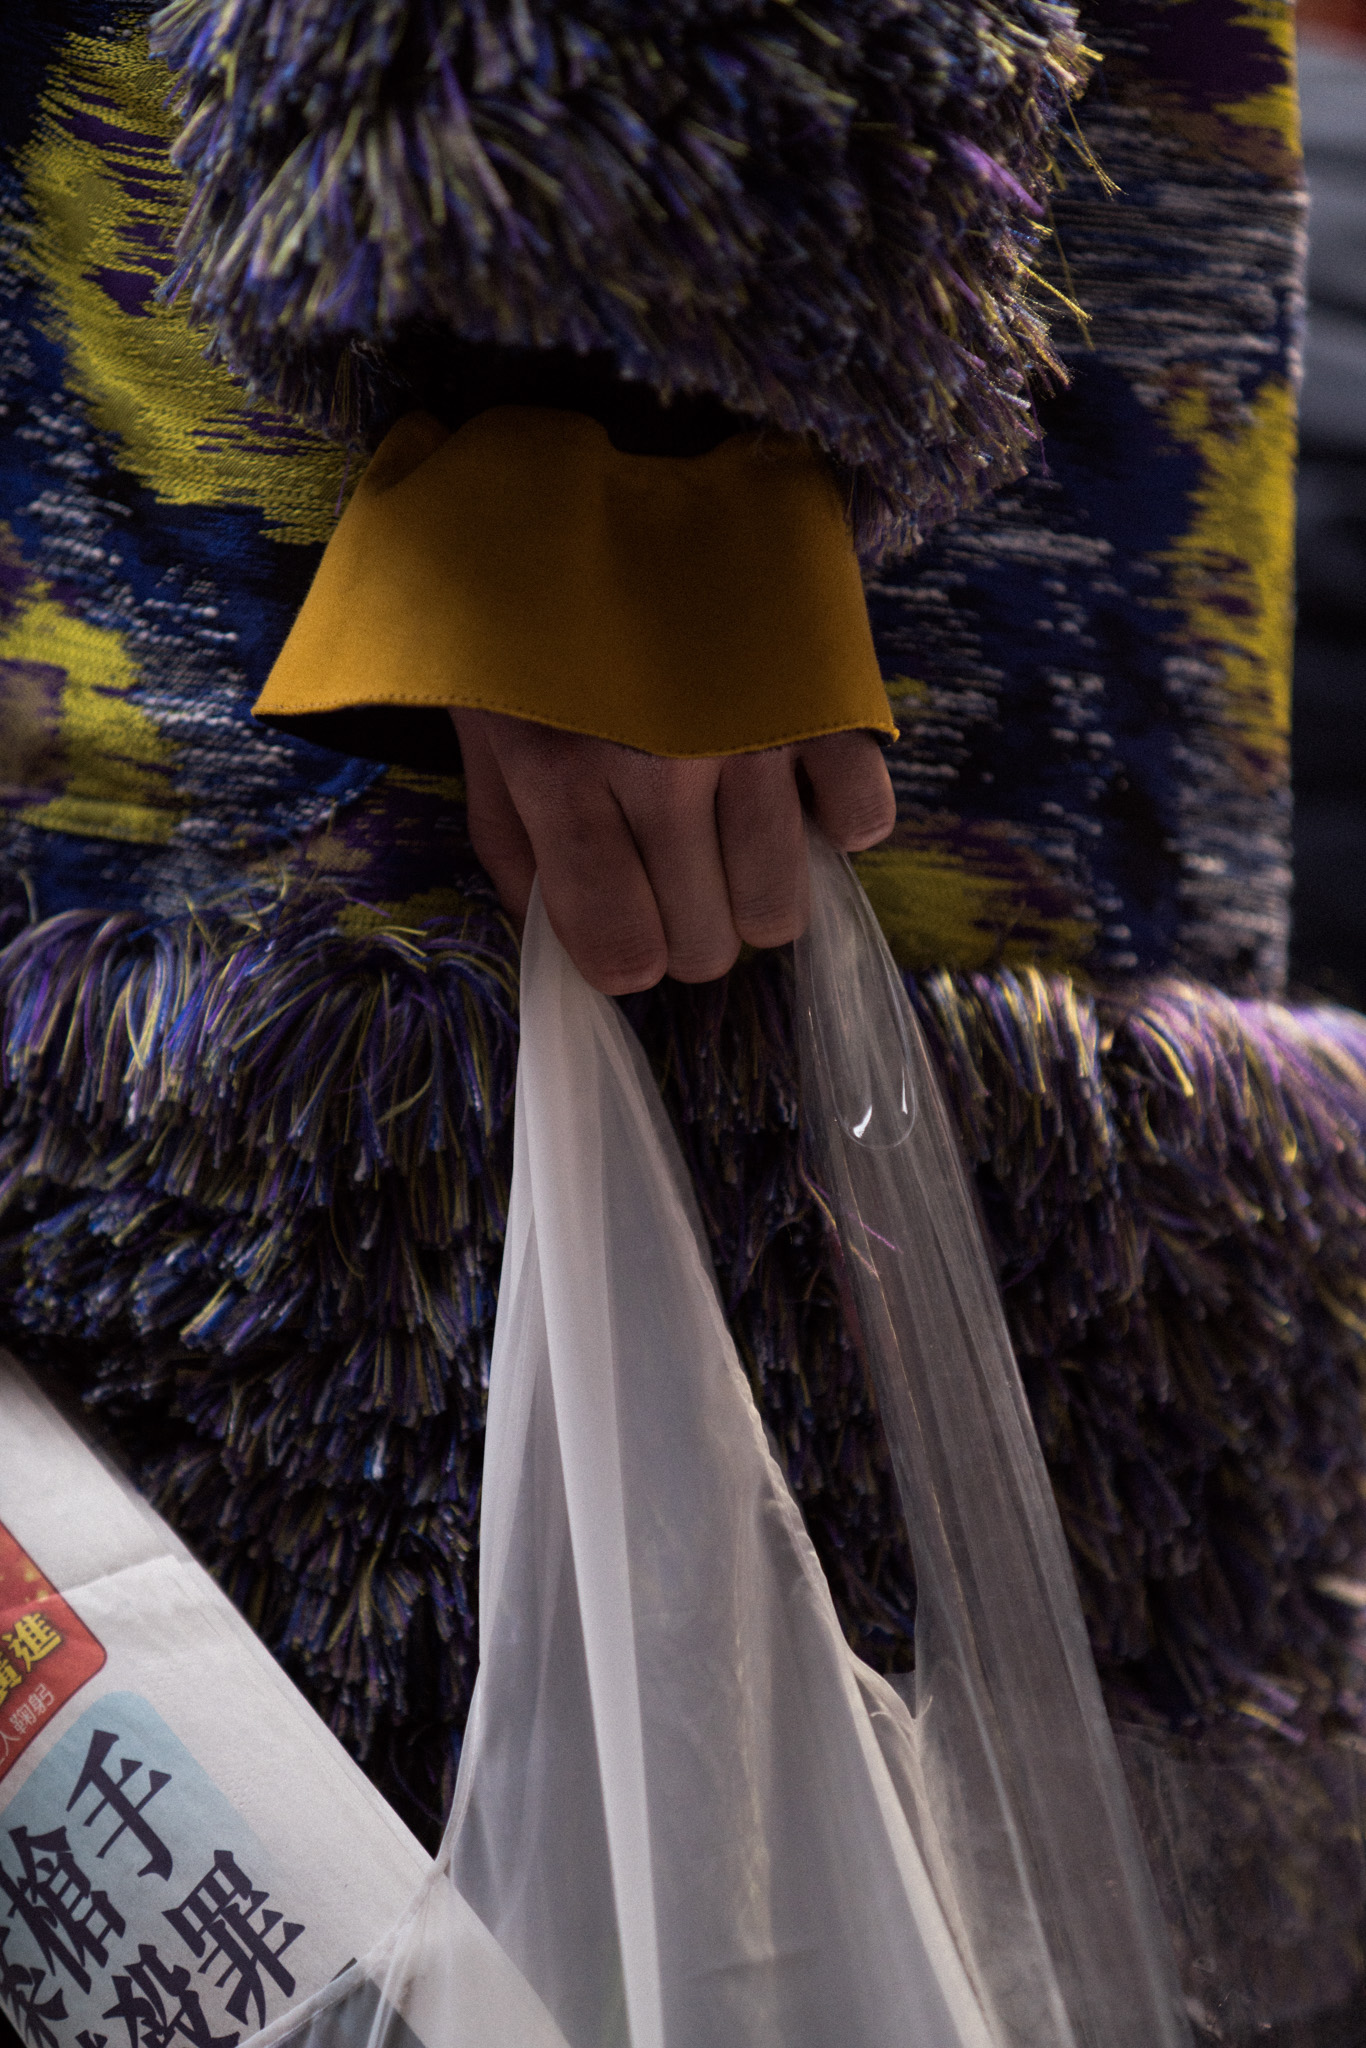 steventai jungle magazine London fashion week Sanne glasbergen